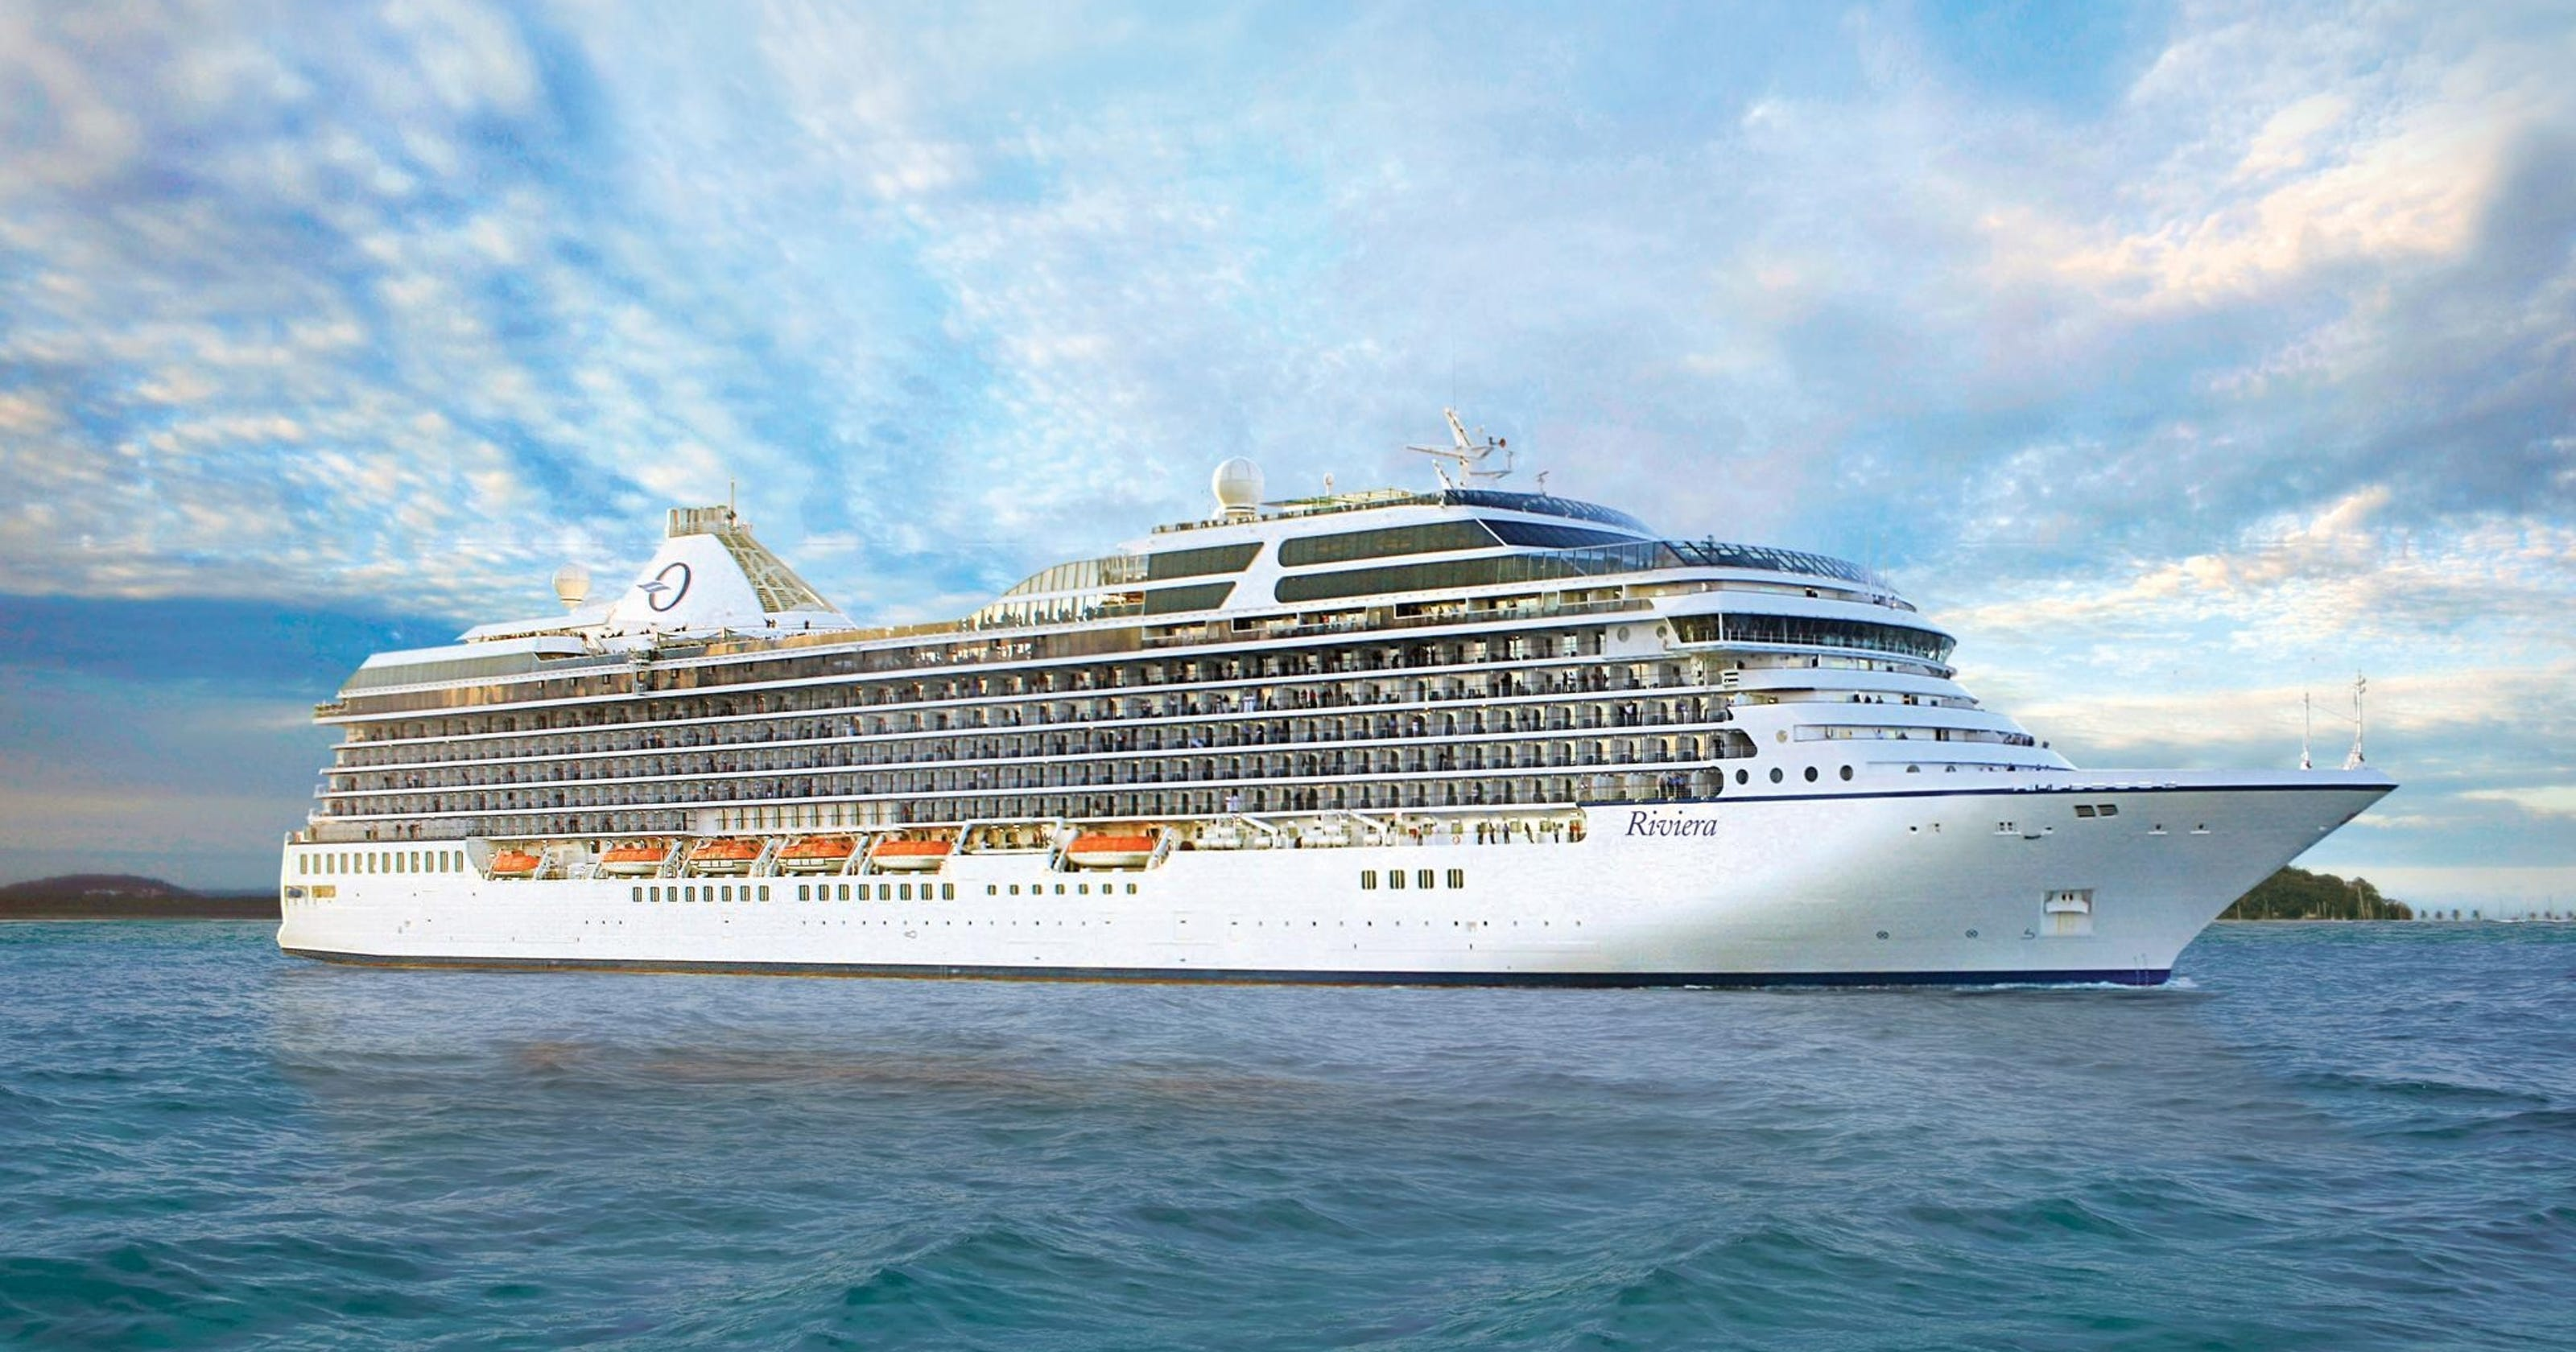 Cruise ship tours: Oceania Cruises' Riviera